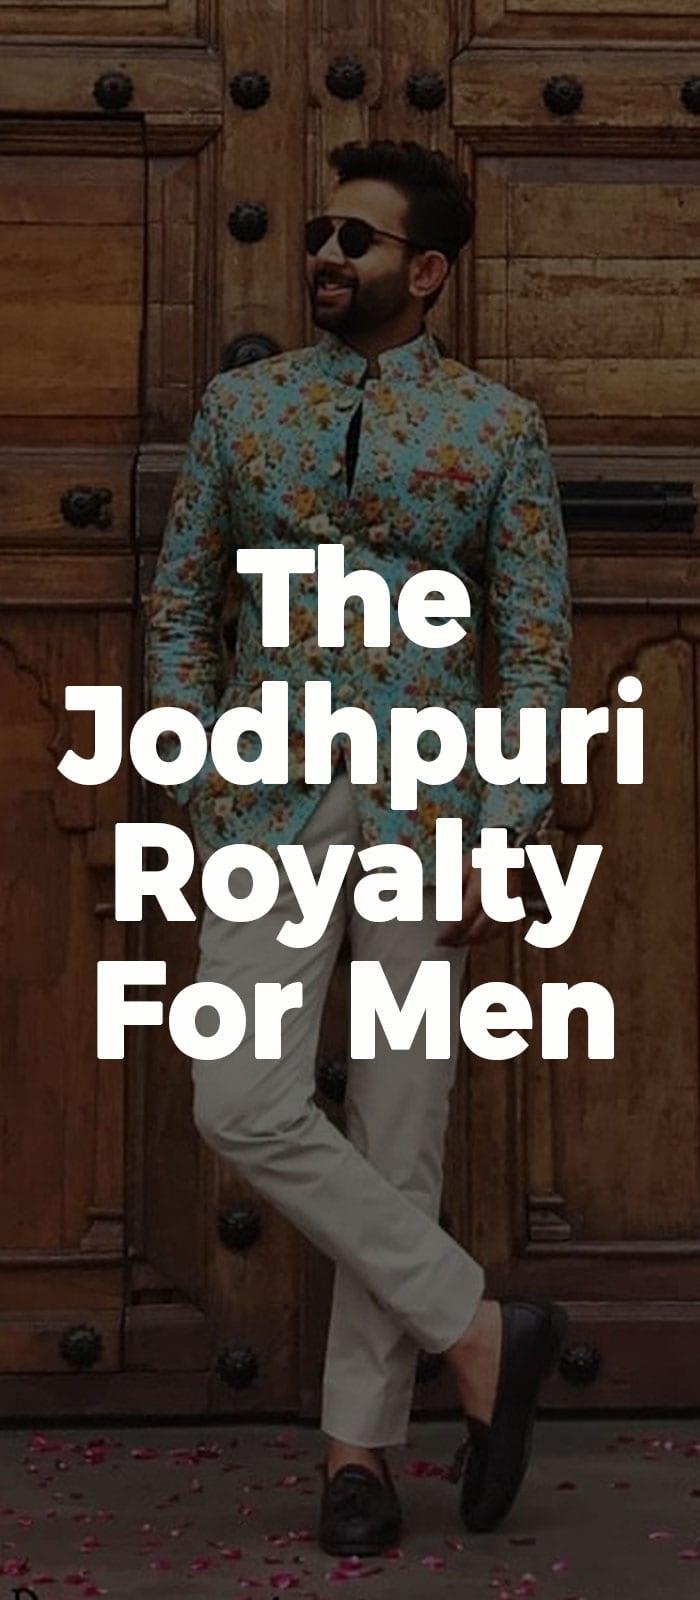 The Jodhpuri Royalty For Men